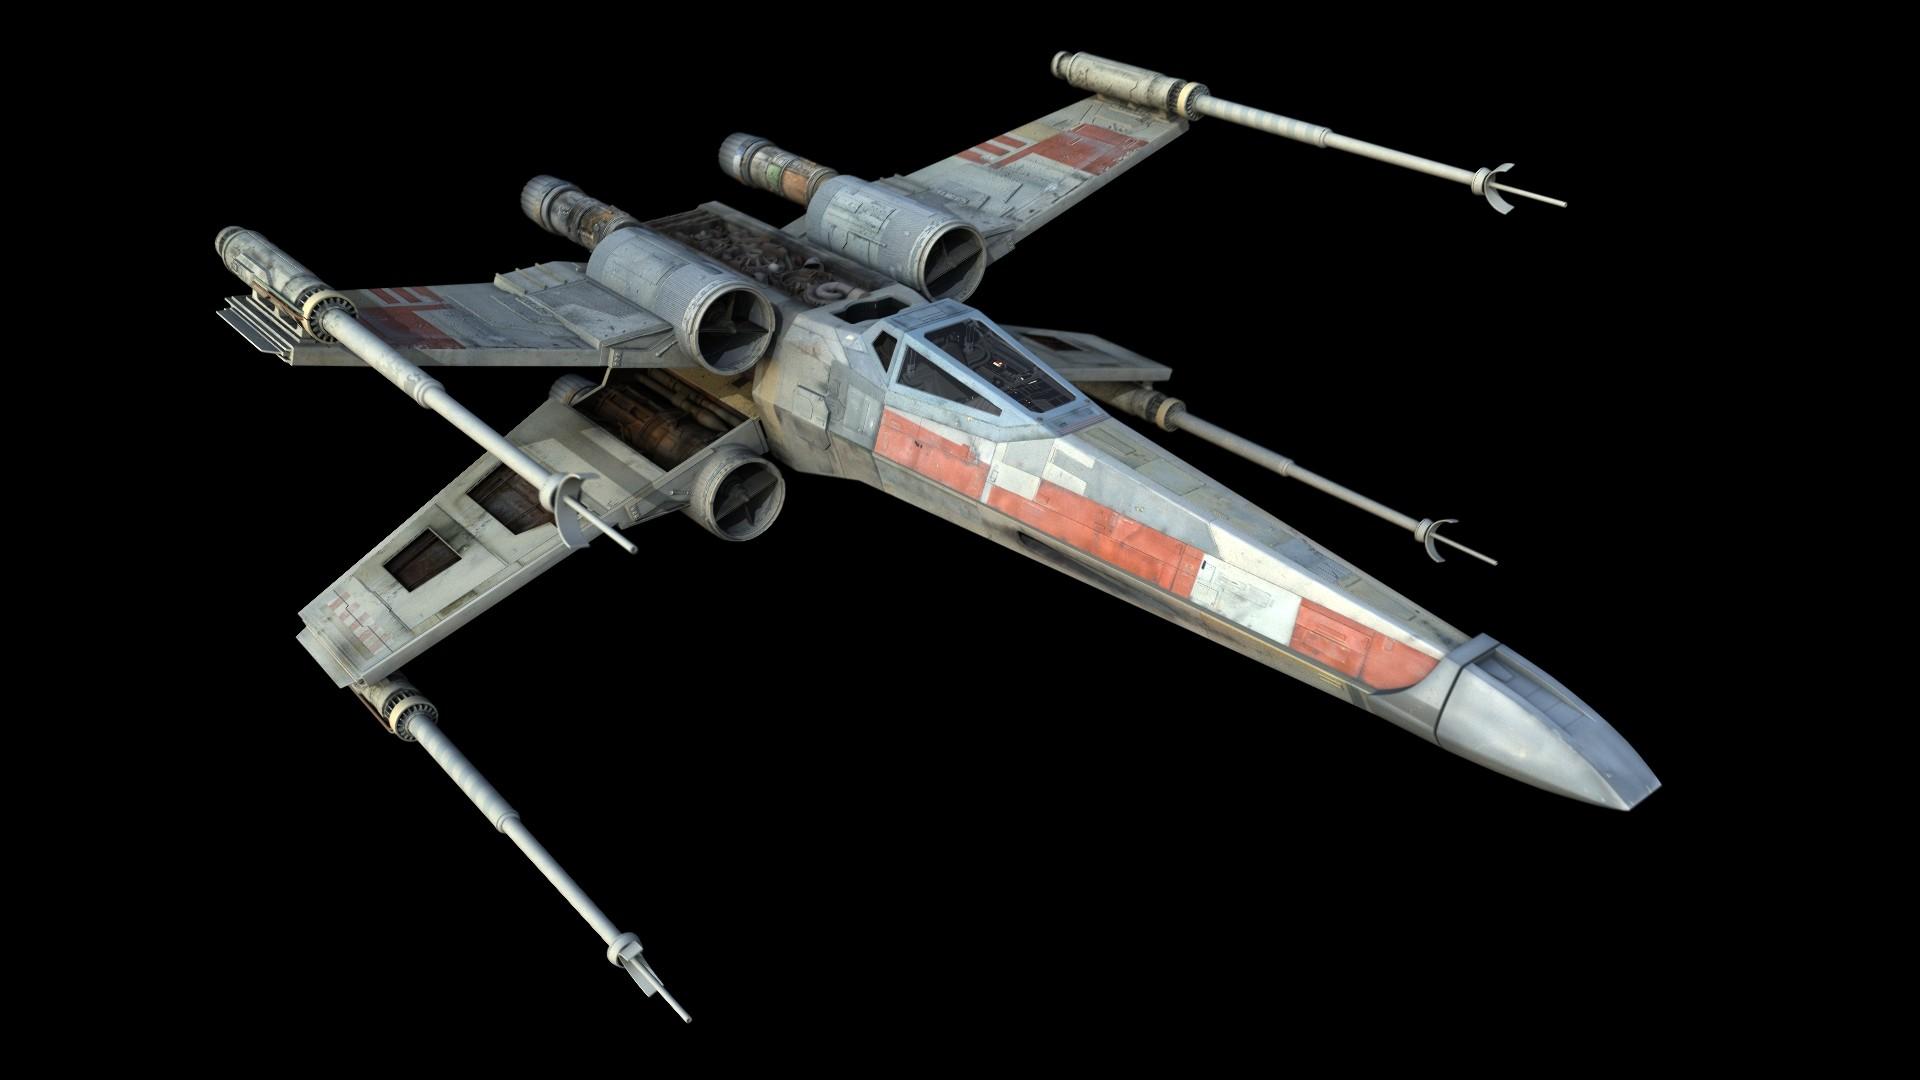 65B X-Wing Fighter by WoodyLWG on DeviantArt